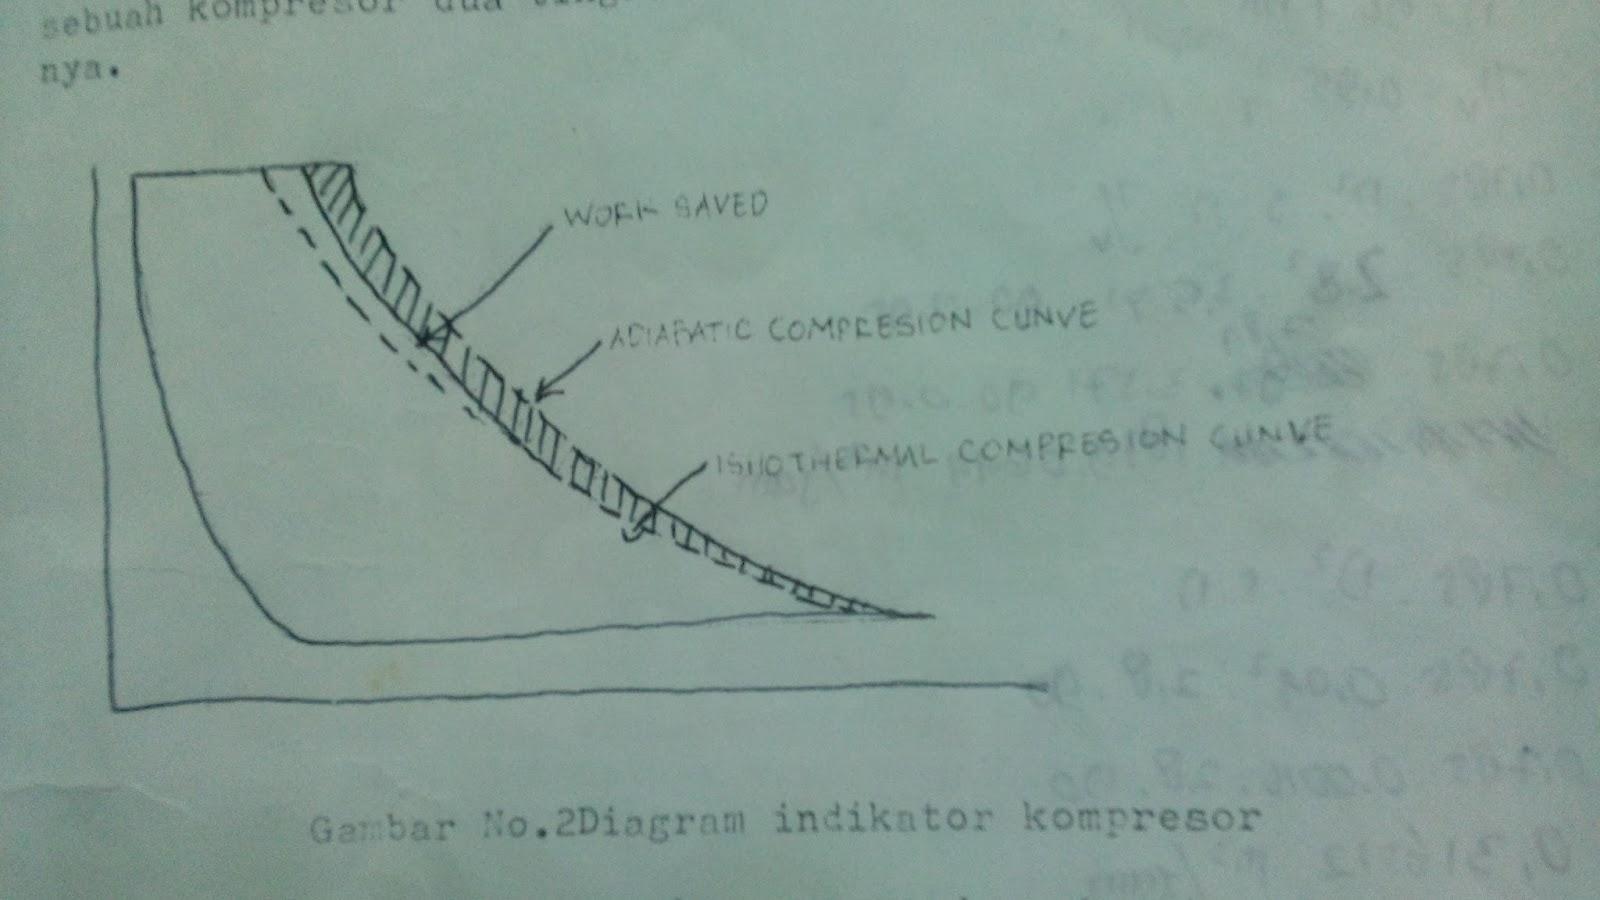 Ujian keahlian pelaut att iv kompresor udara gambar no2 diagram indikator kompresor ccuart Image collections